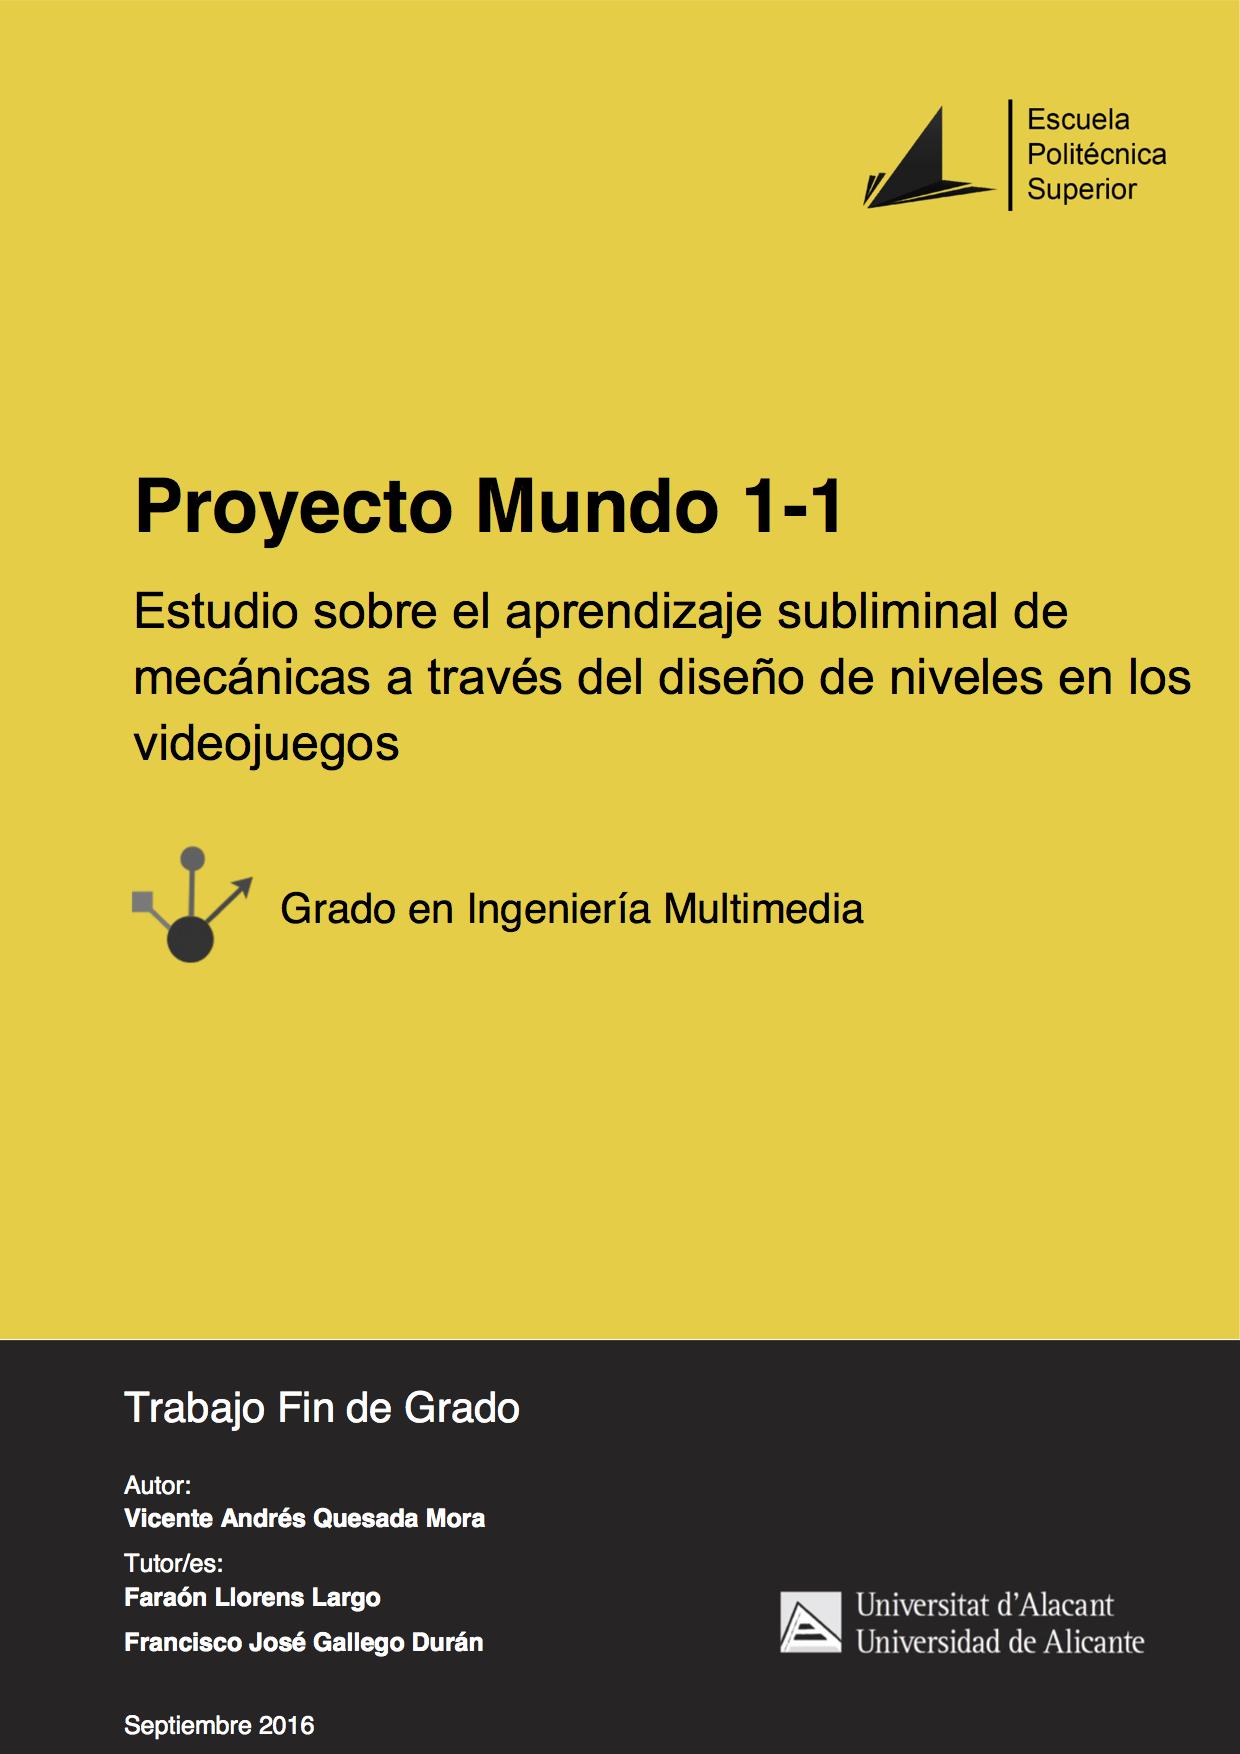 proyecto-mundo-1-1-portada